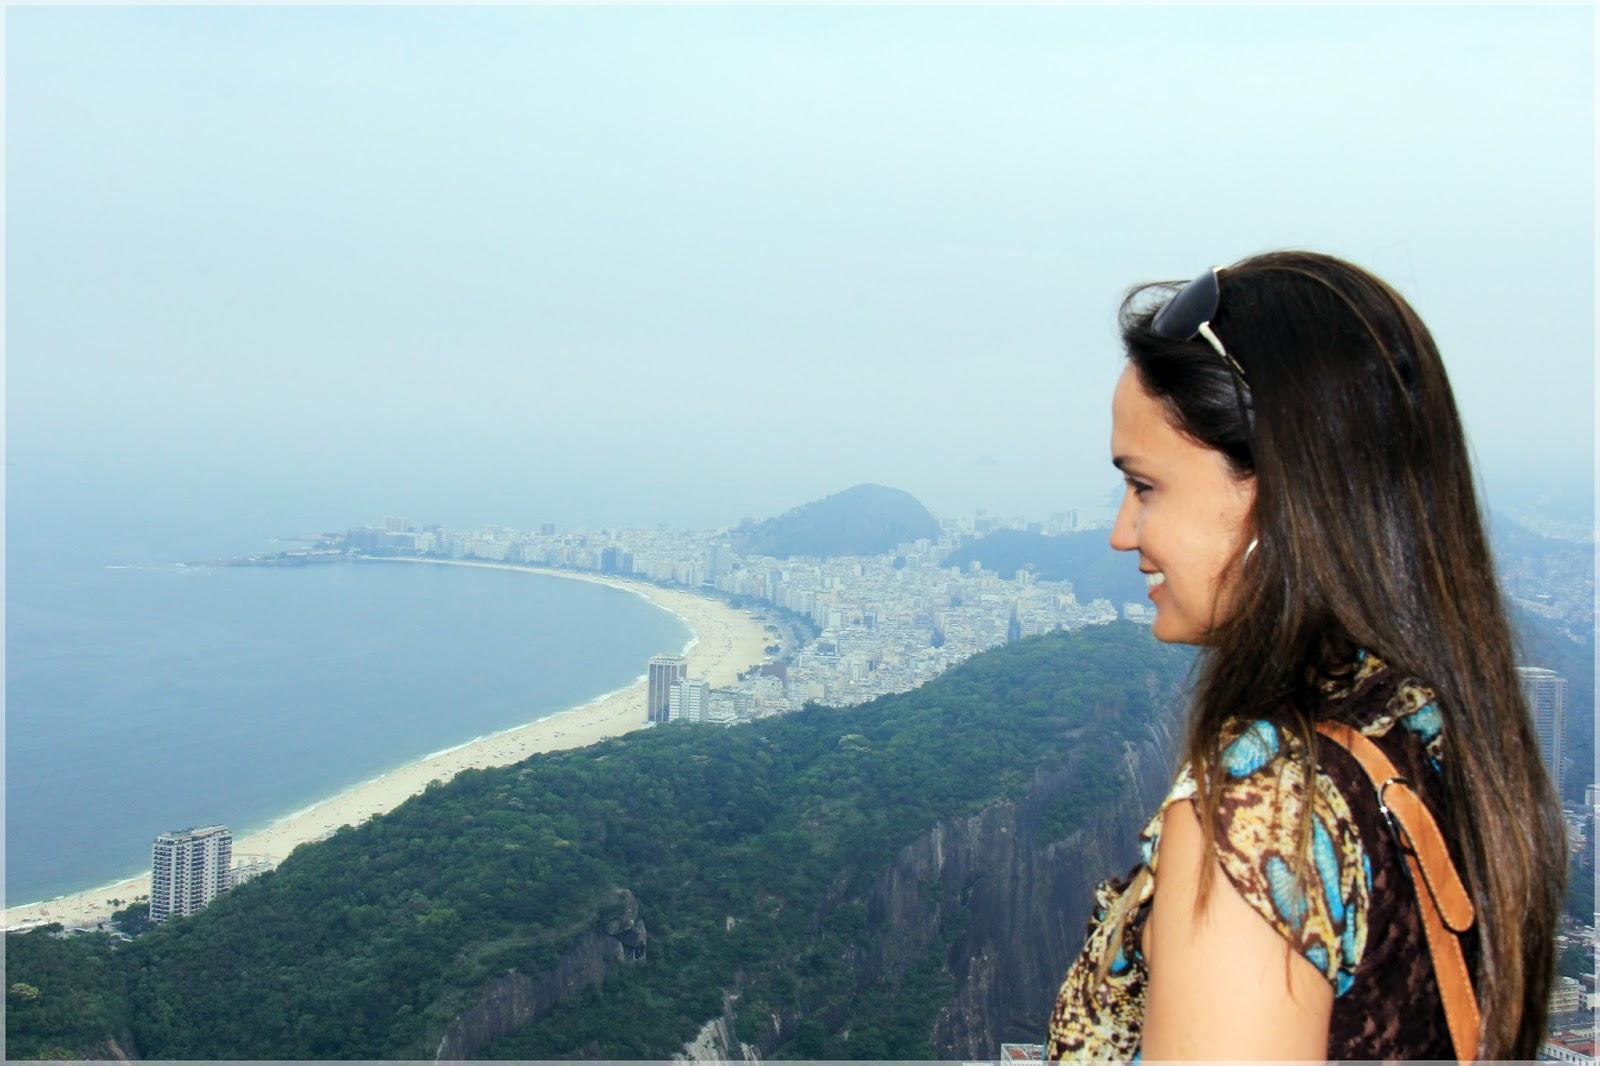 Primeira Vez Anunciada No Rio De Janeiro-7035